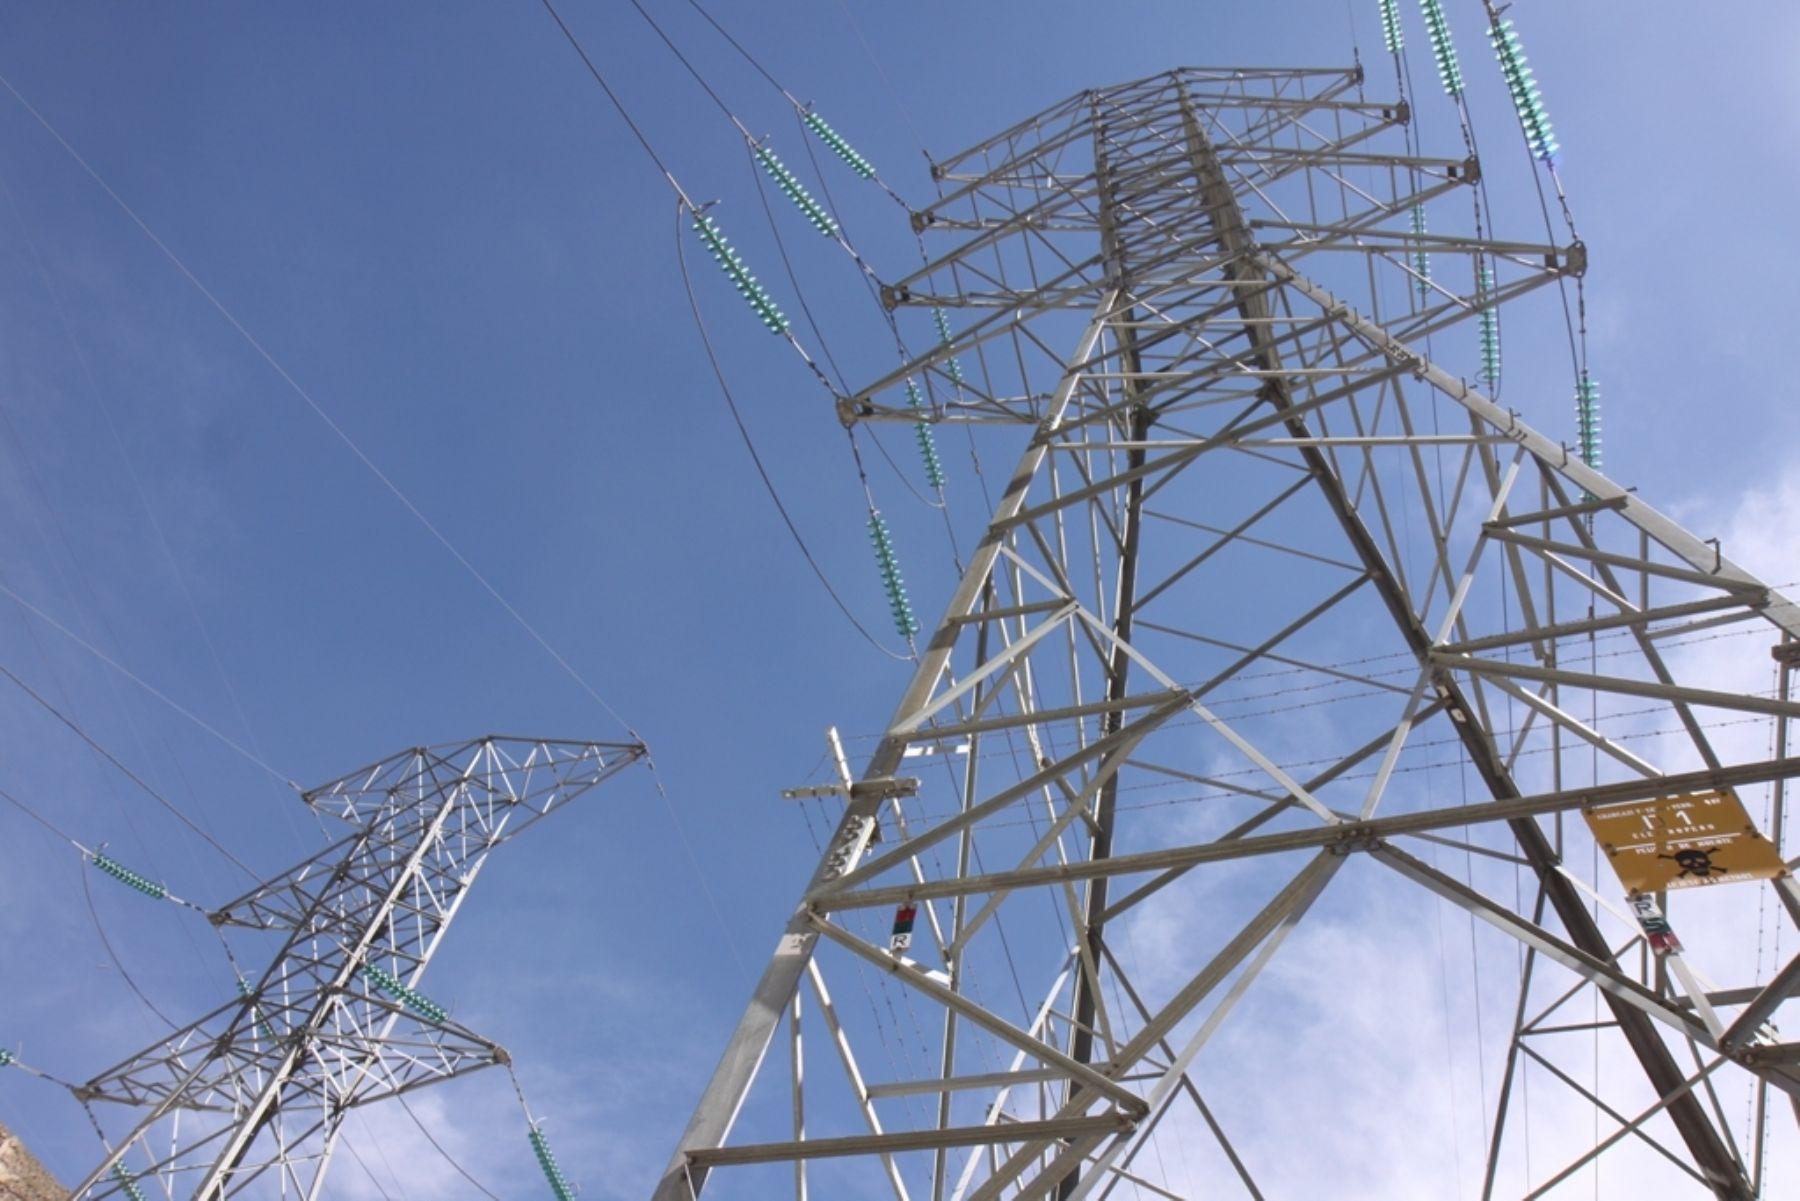 Línea de transmisión de energía eléctrica. ANDINA/Difusión